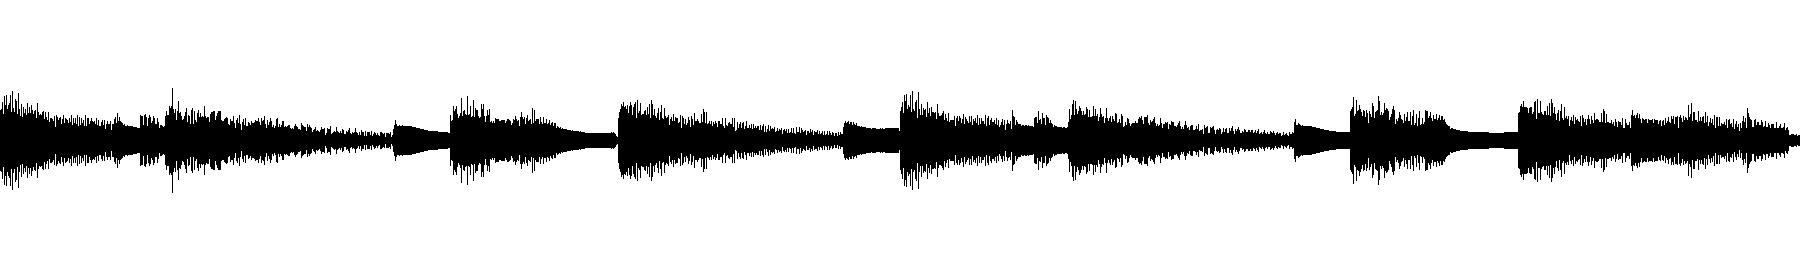 140bpm